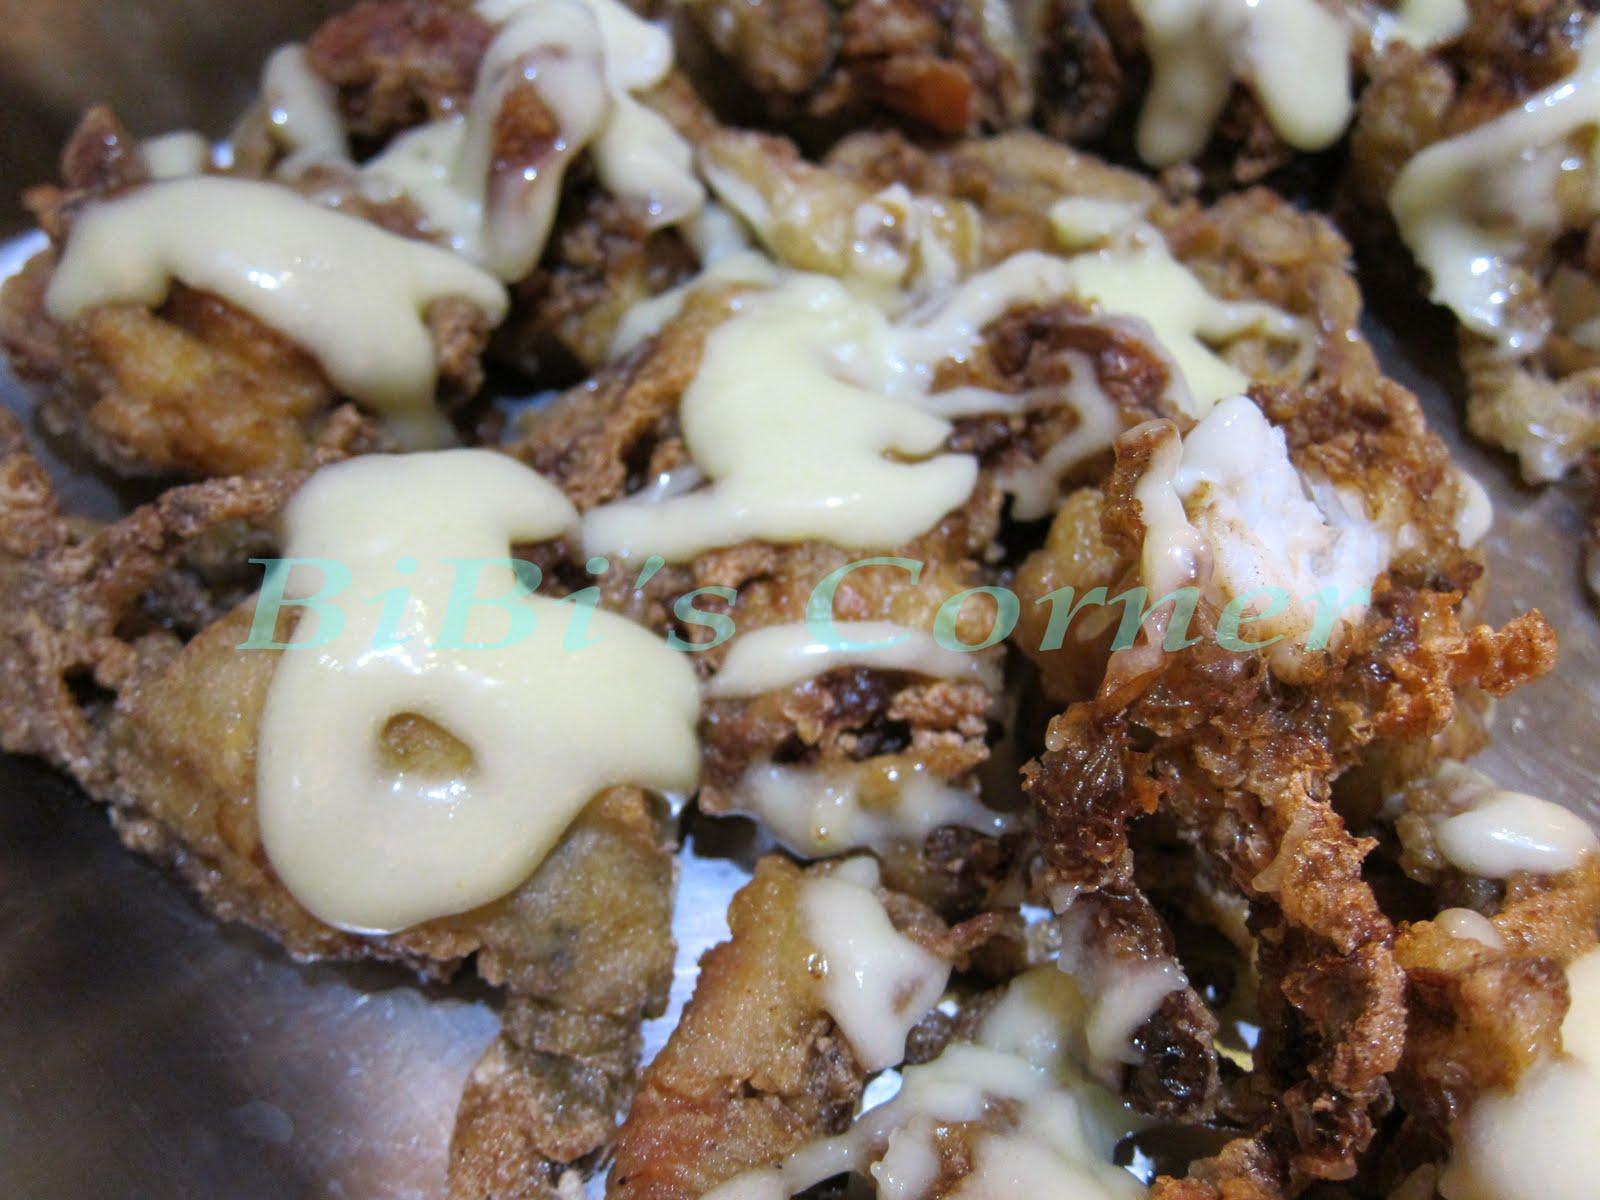 photo Mango Rice Pudding with Chocolate Shavings